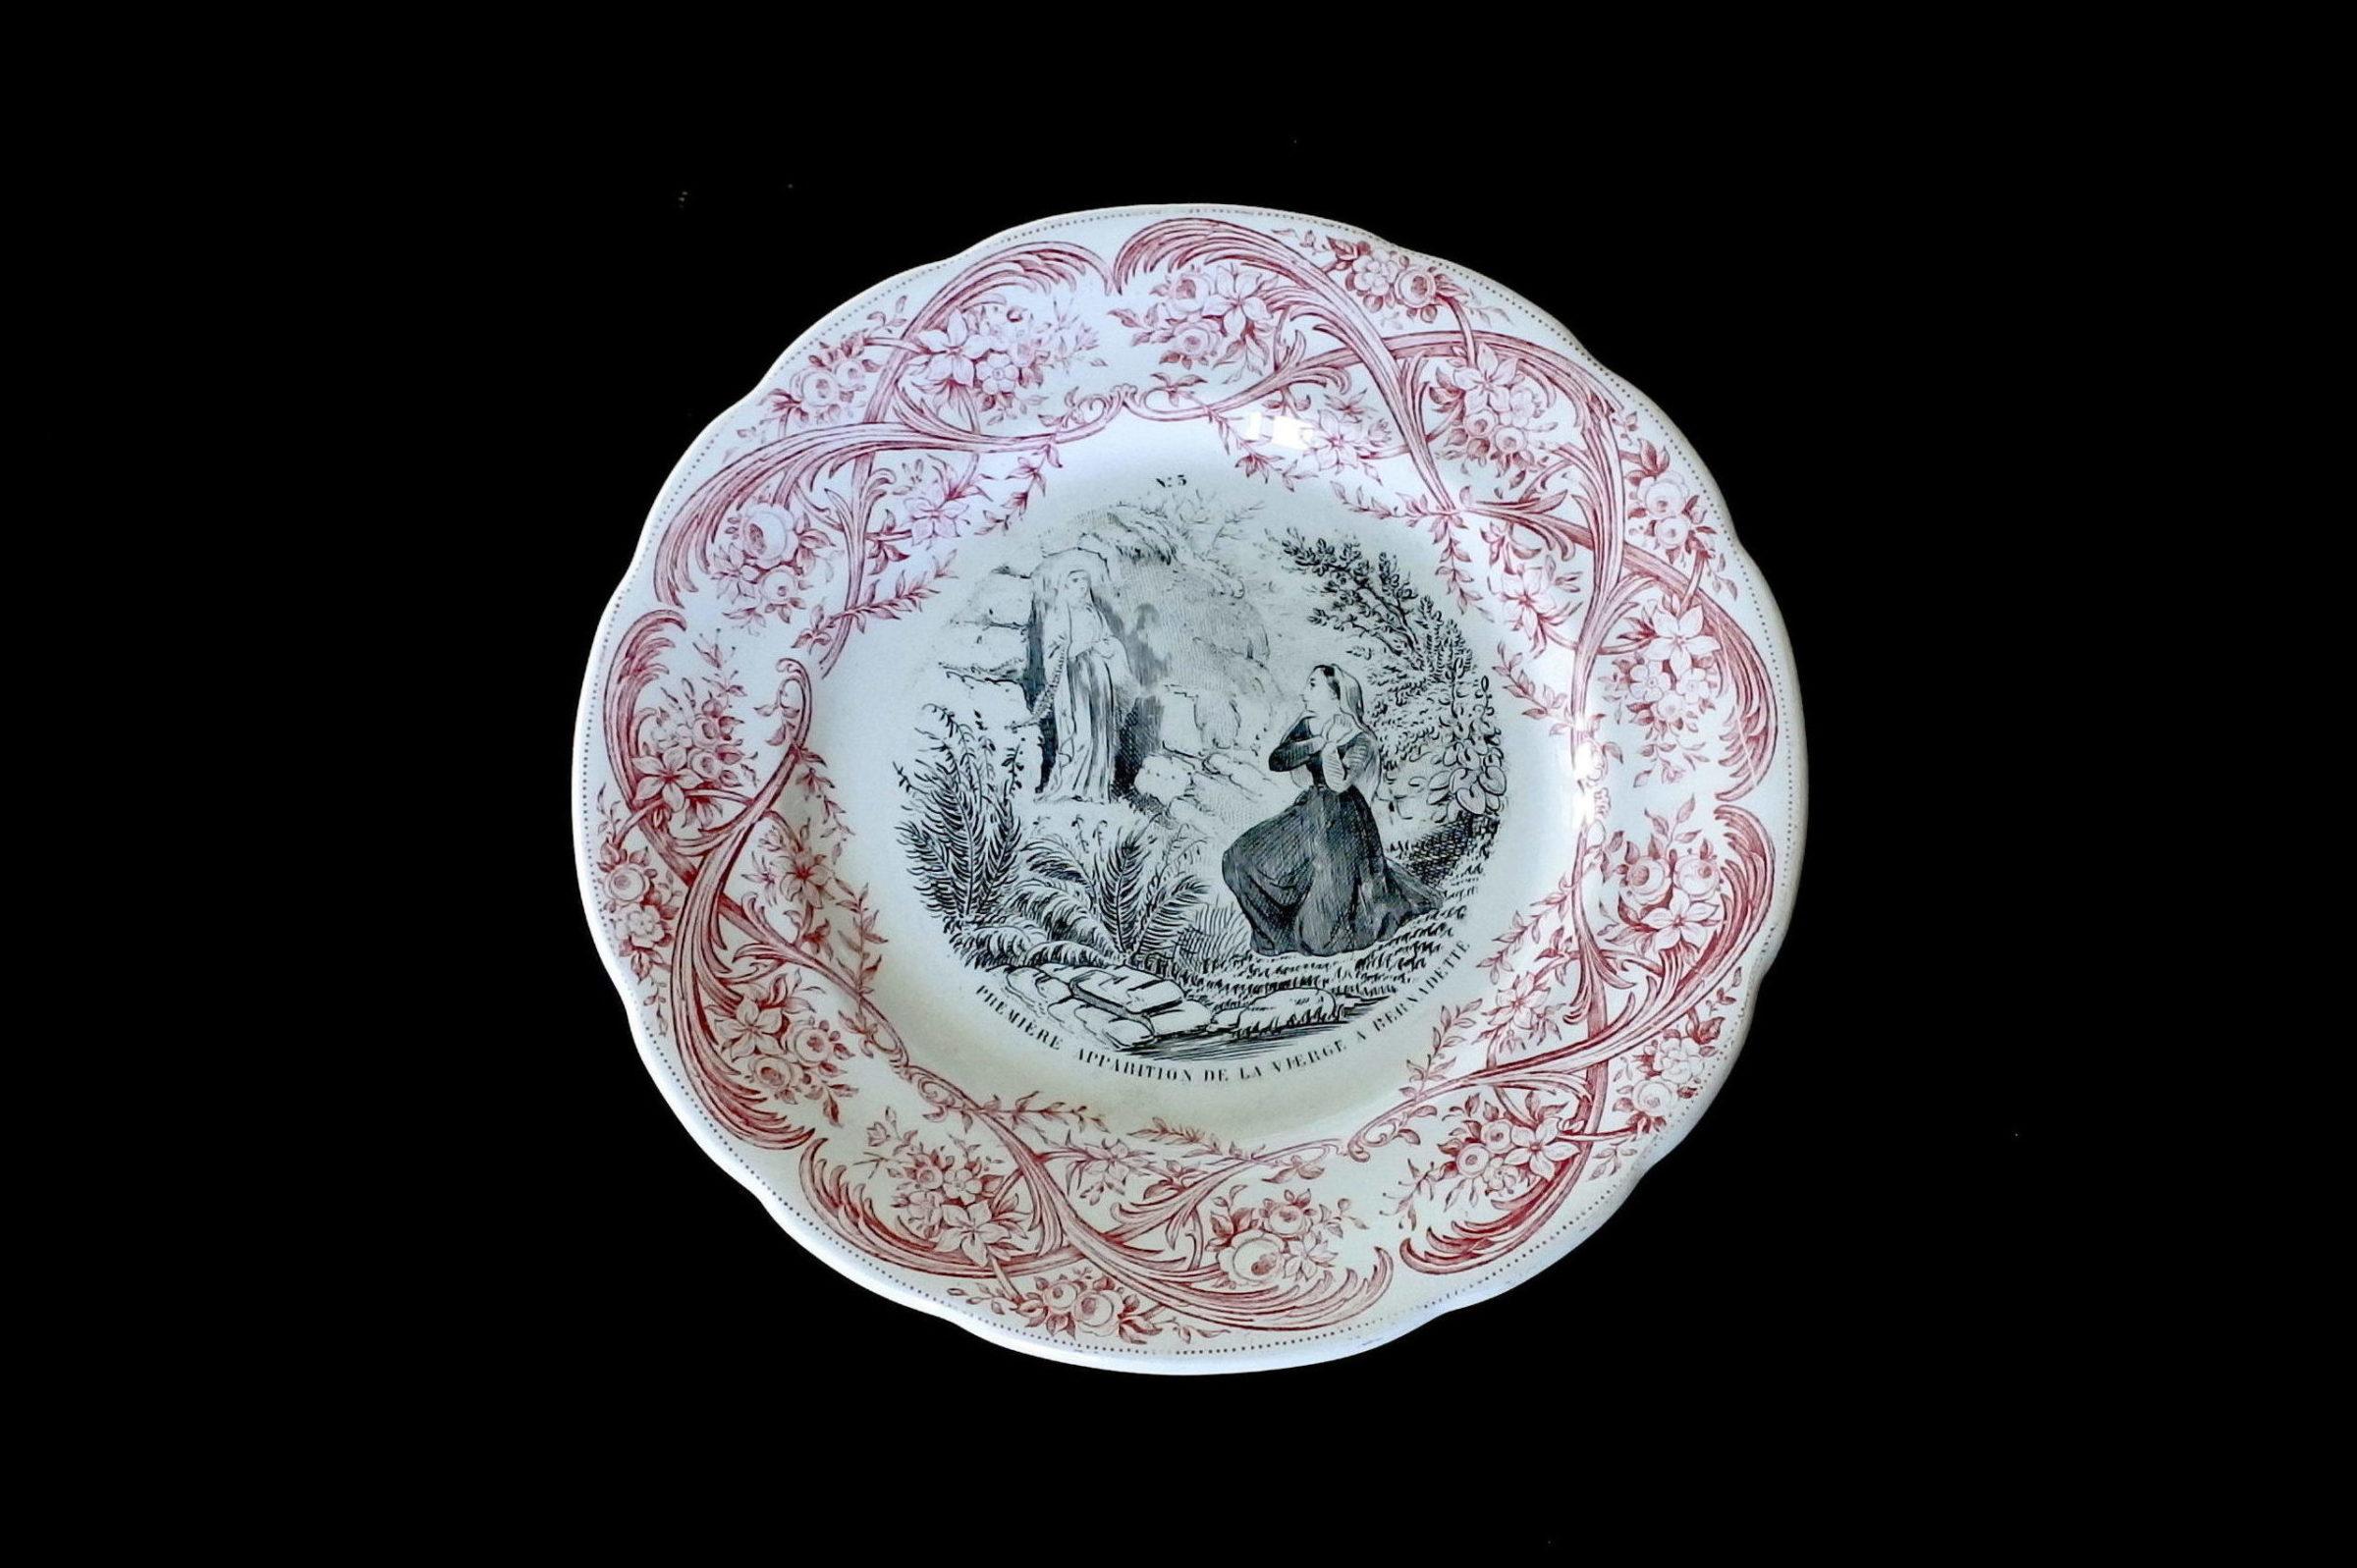 Serie completa di 12 piatti in ceramica dedicati alla vita di Bernadette - 4